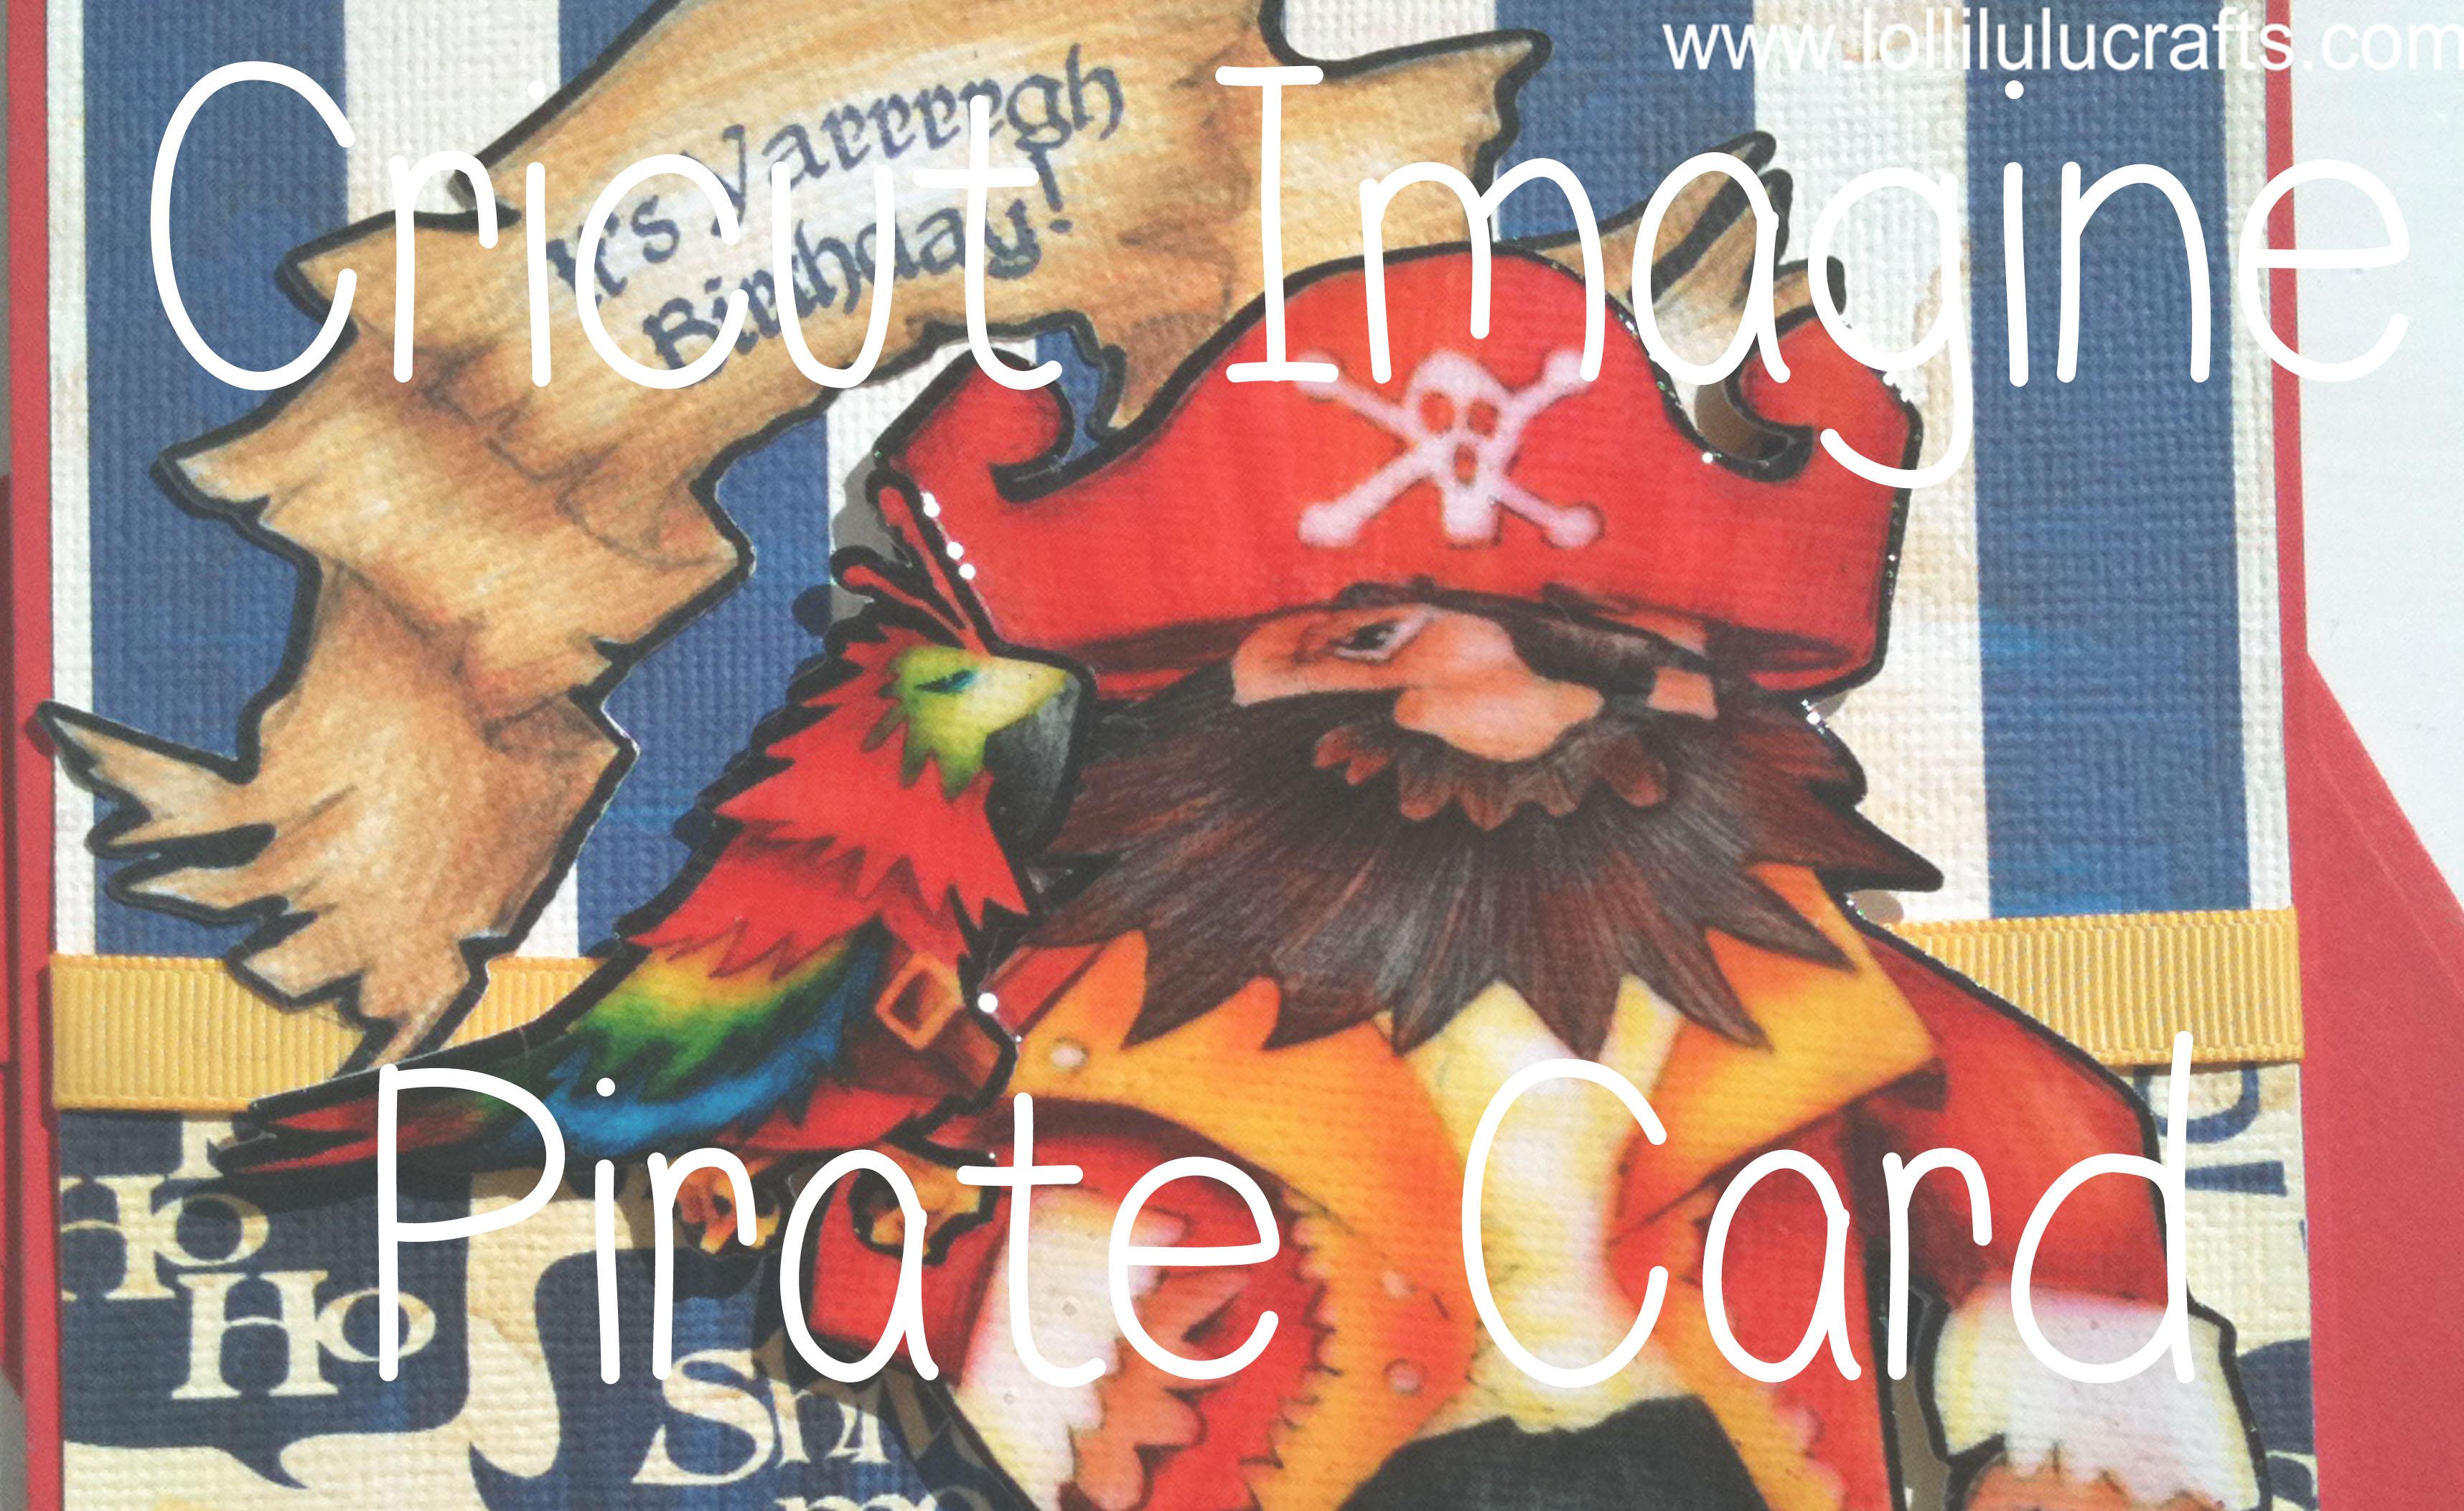 Pirate Thumb Video